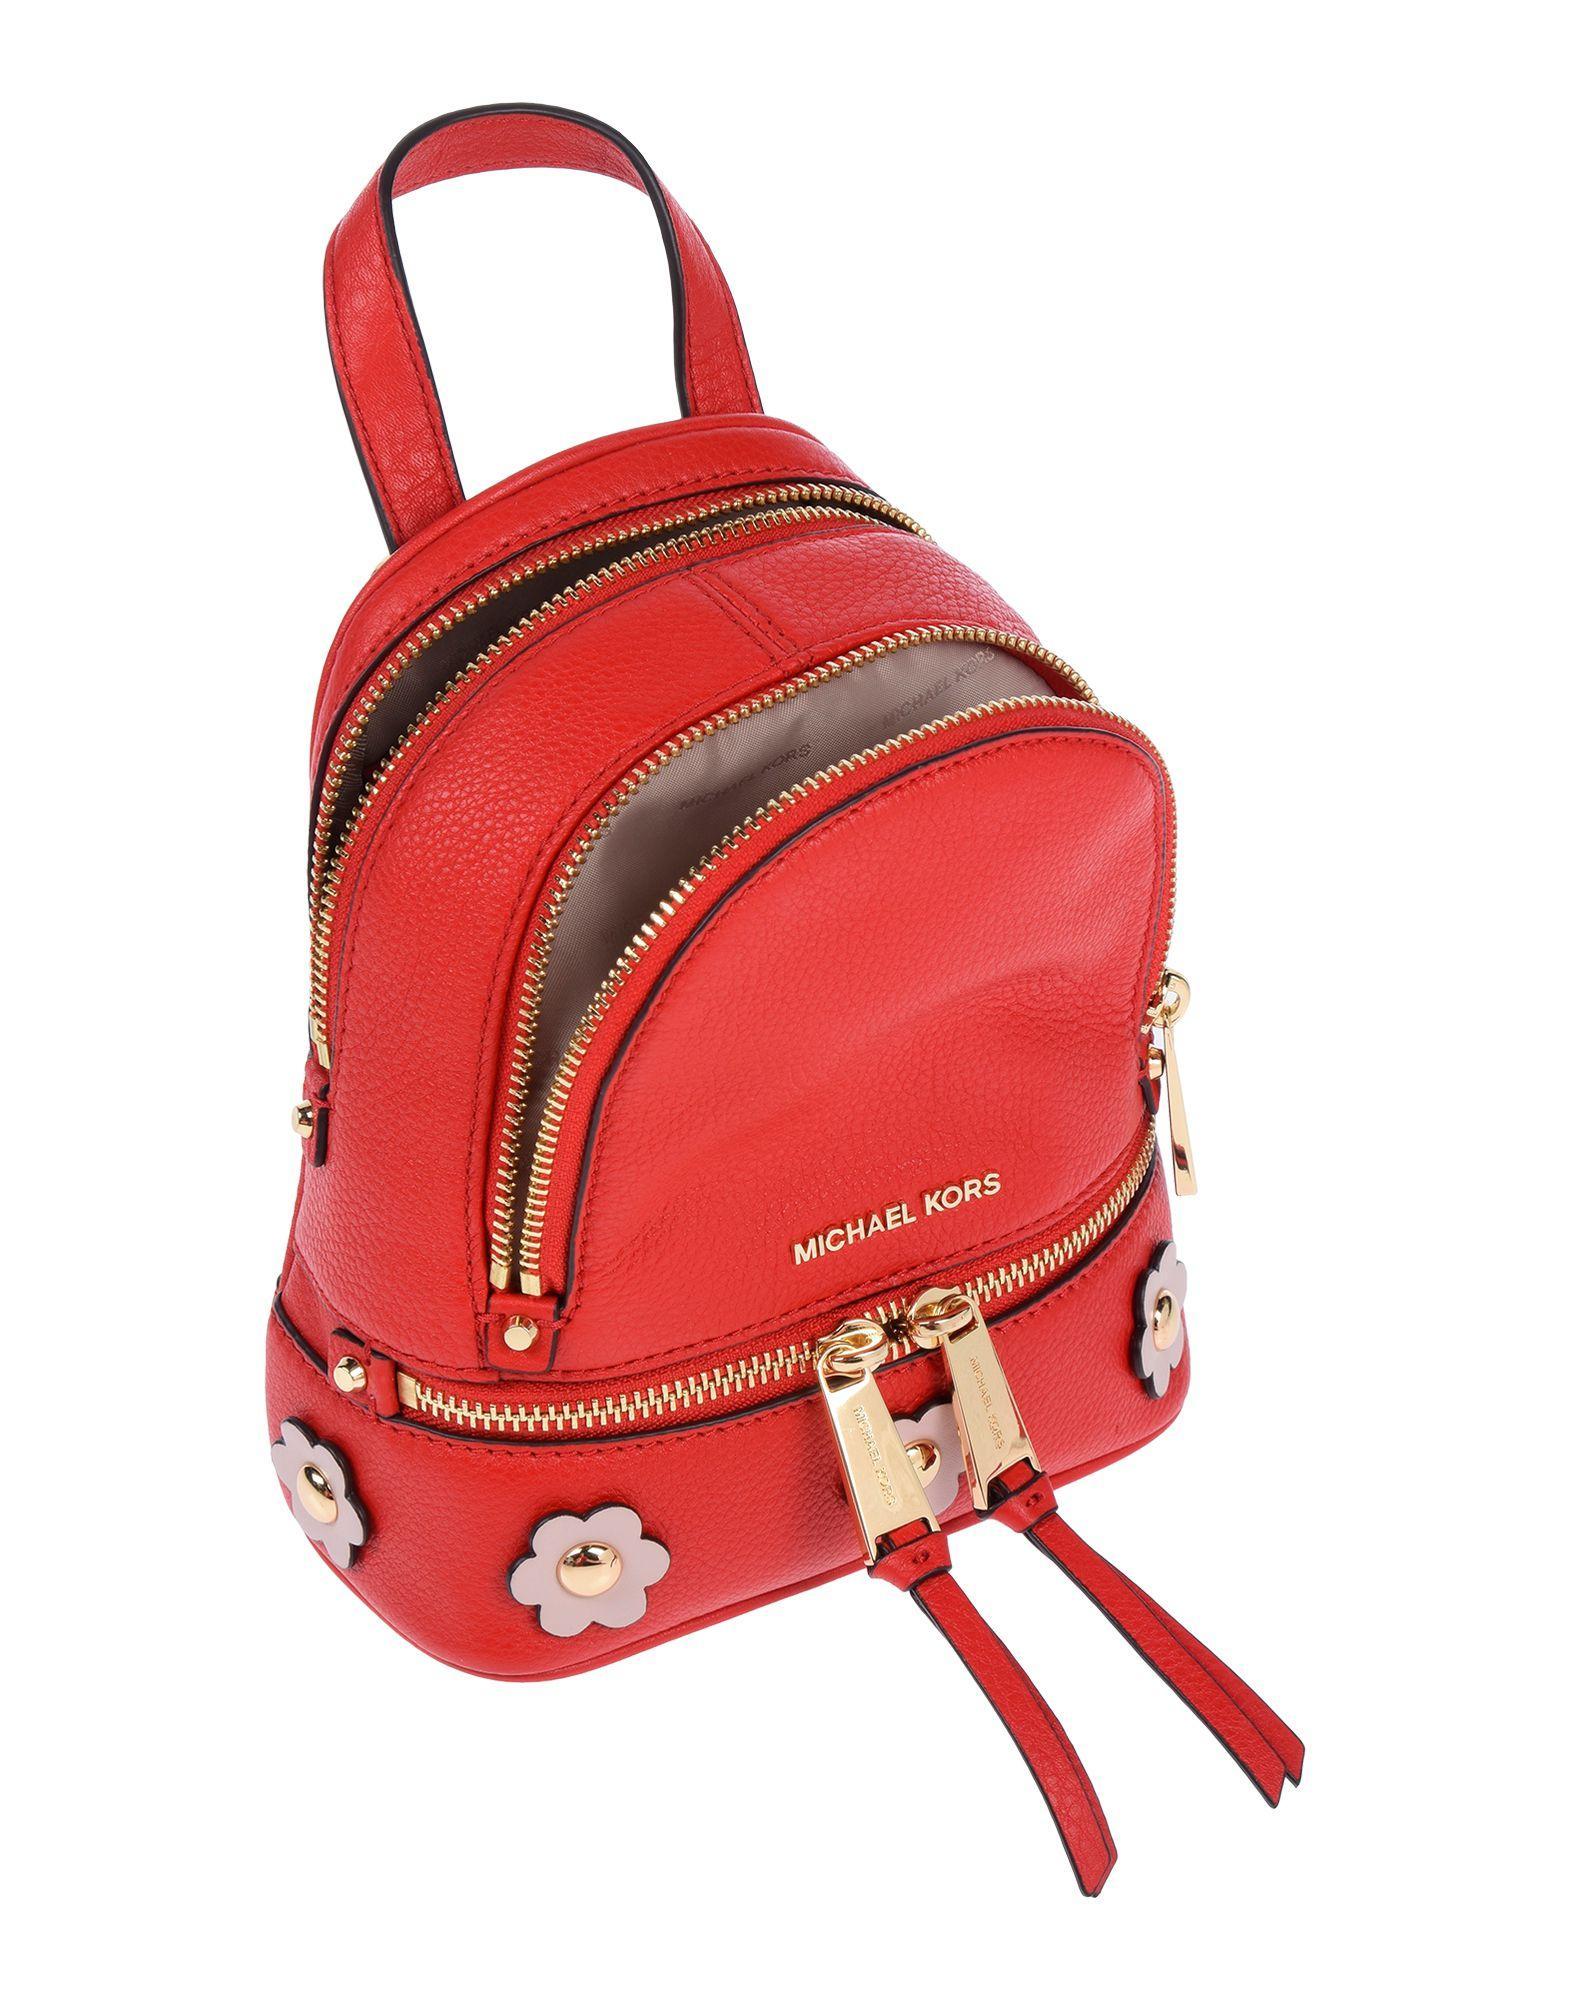 74326711ff06 Michael Kors Backpacks & Bum Bags in Red - Lyst